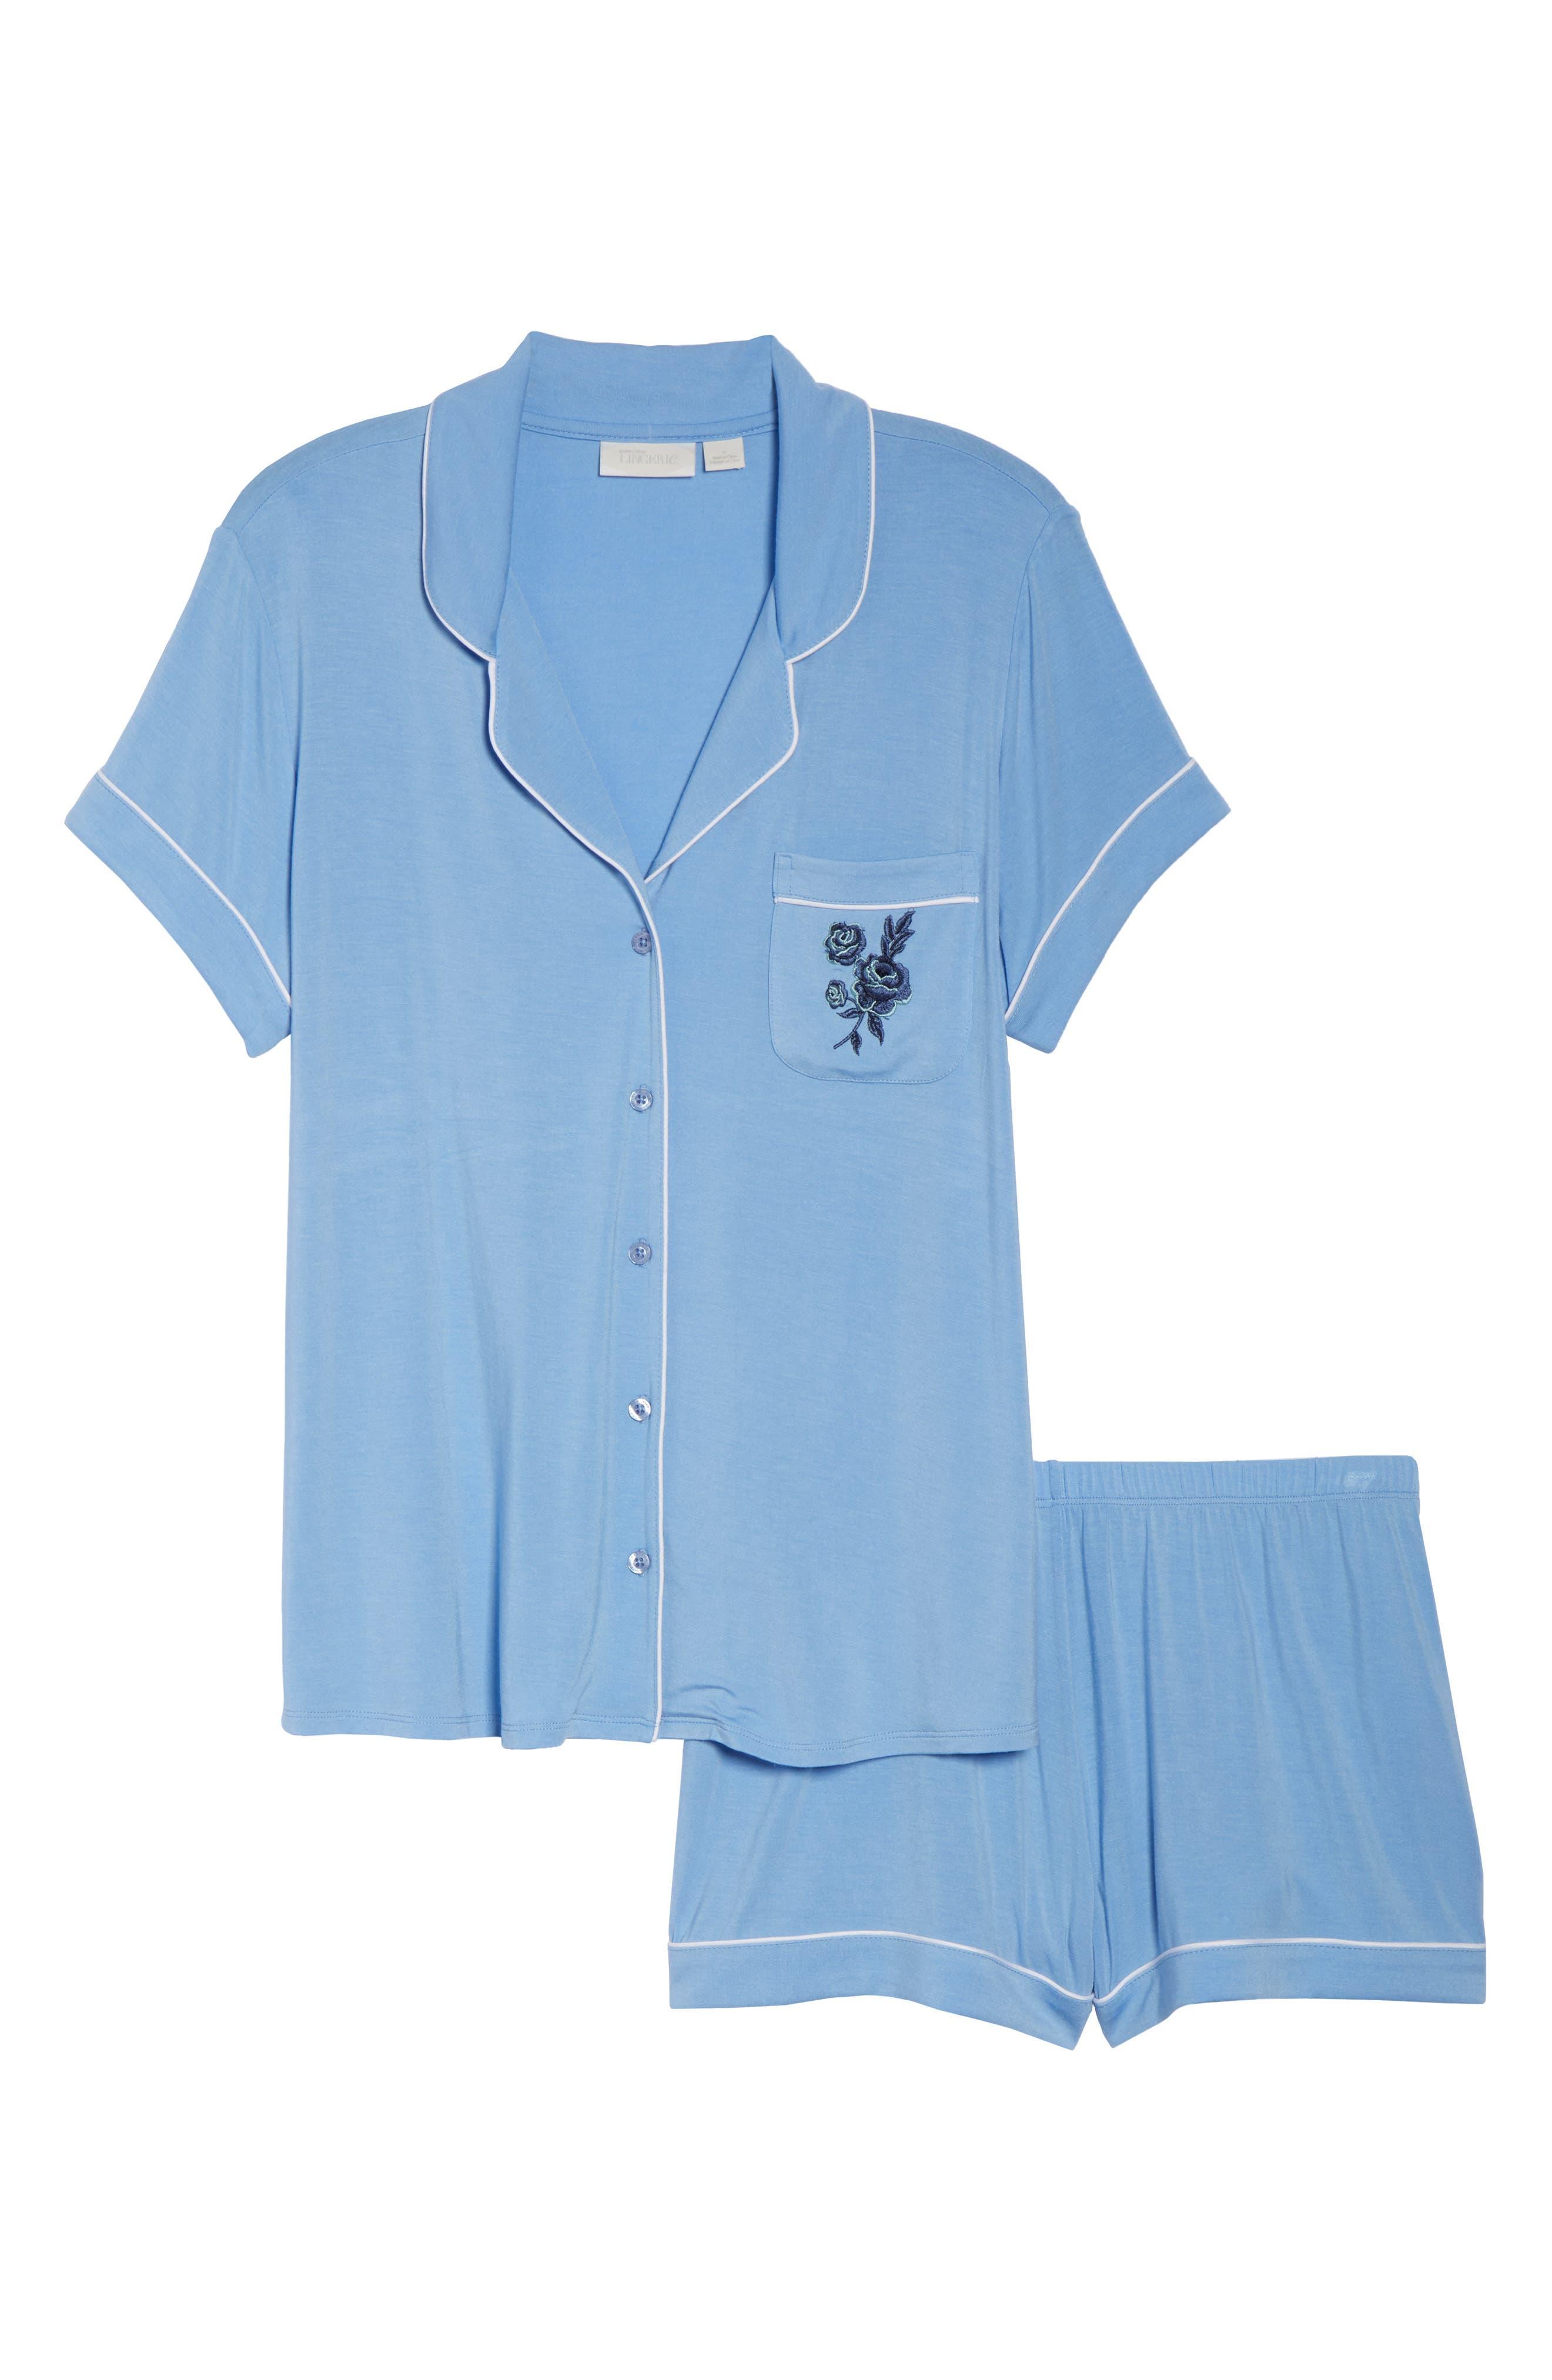 Moonlight Shortie Pajamas,                             Alternate thumbnail 6, color,                             421